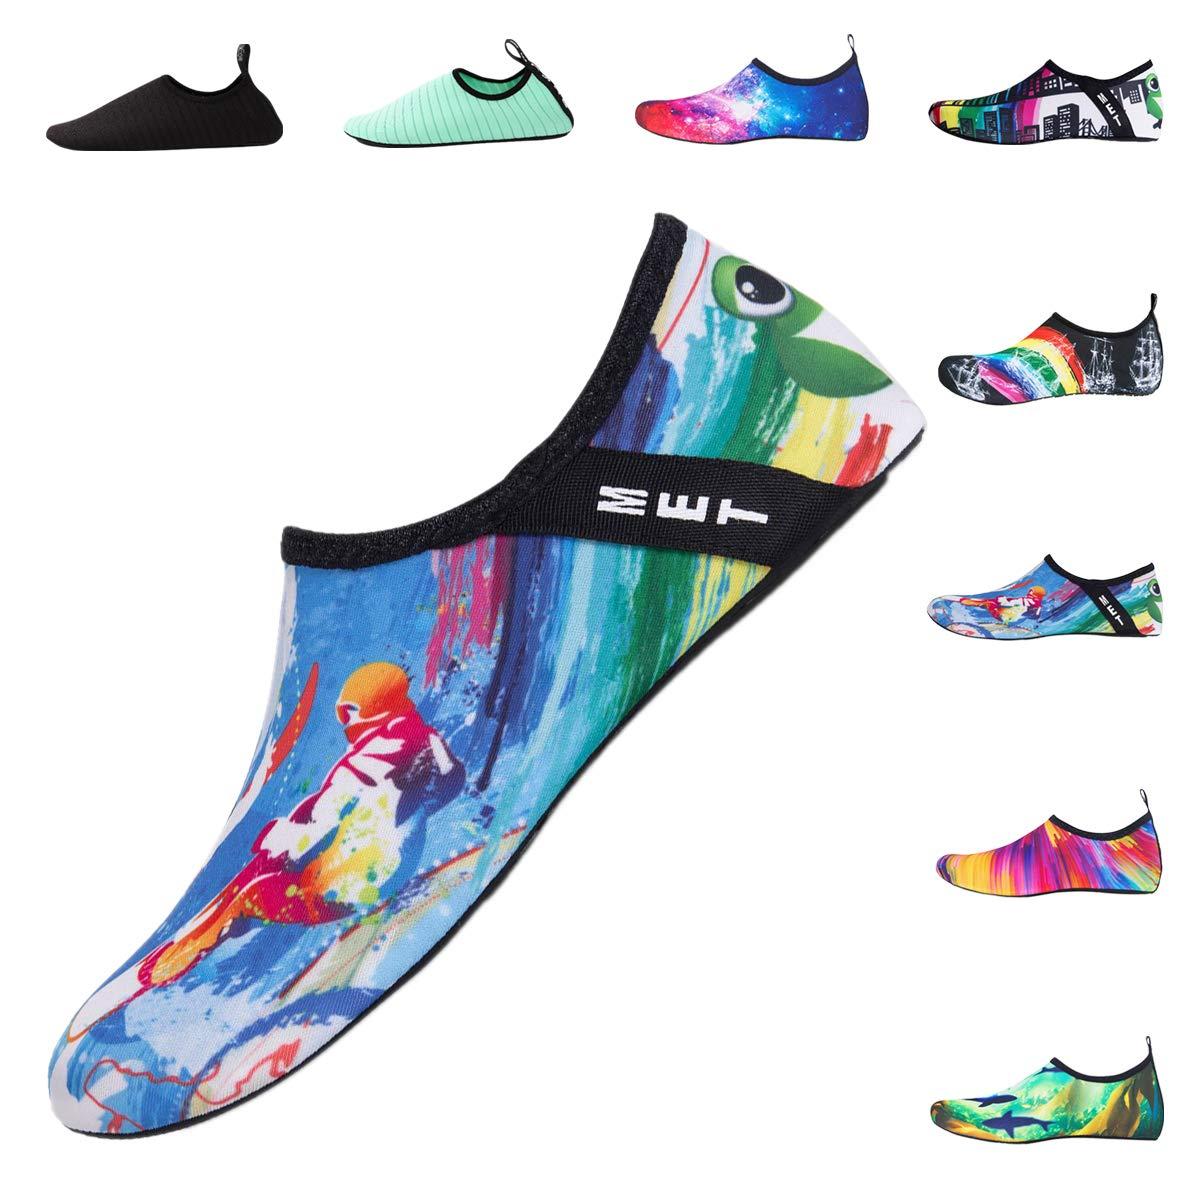 DoGeek Water Shoes Womens Mens and Kids Aqua Shoes Barefoot Quick-Dry Aqua Socks for Beach Swim Surf Yoga Exercise